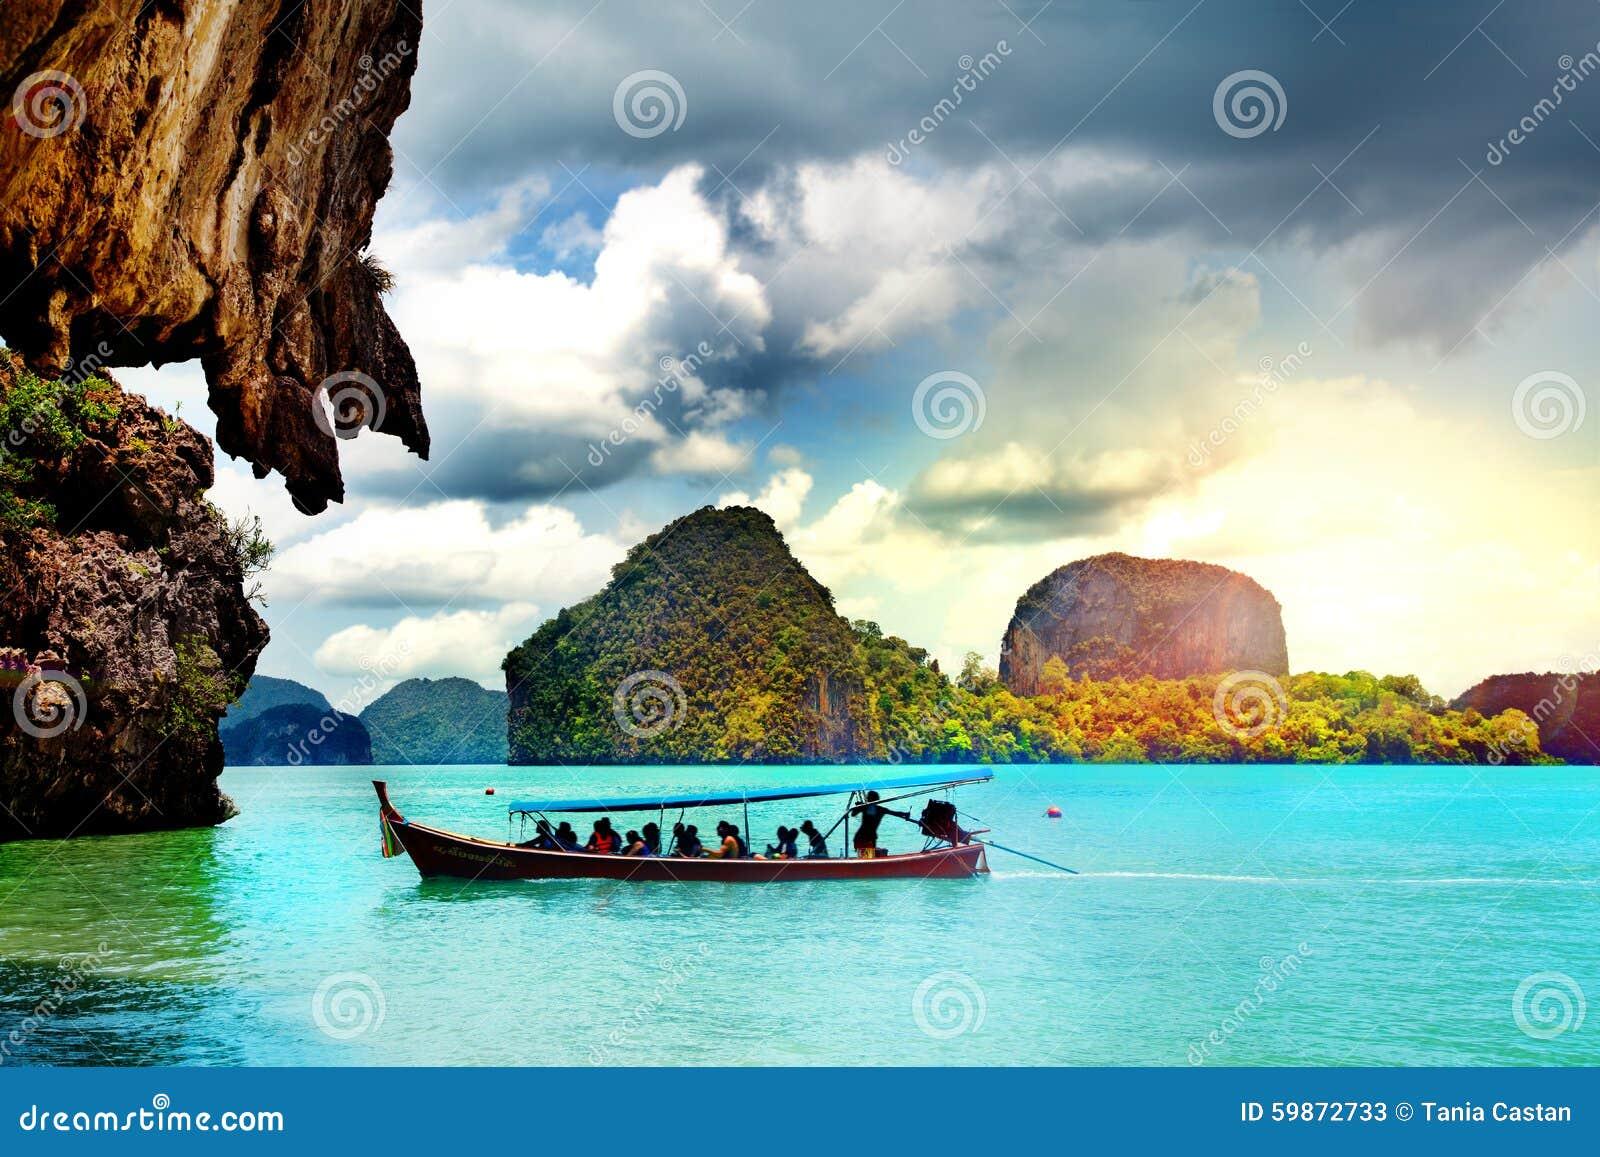 Paisagem bonita da praia em Tailândia Baía de Phang Nga, mar de Andaman, Phuket